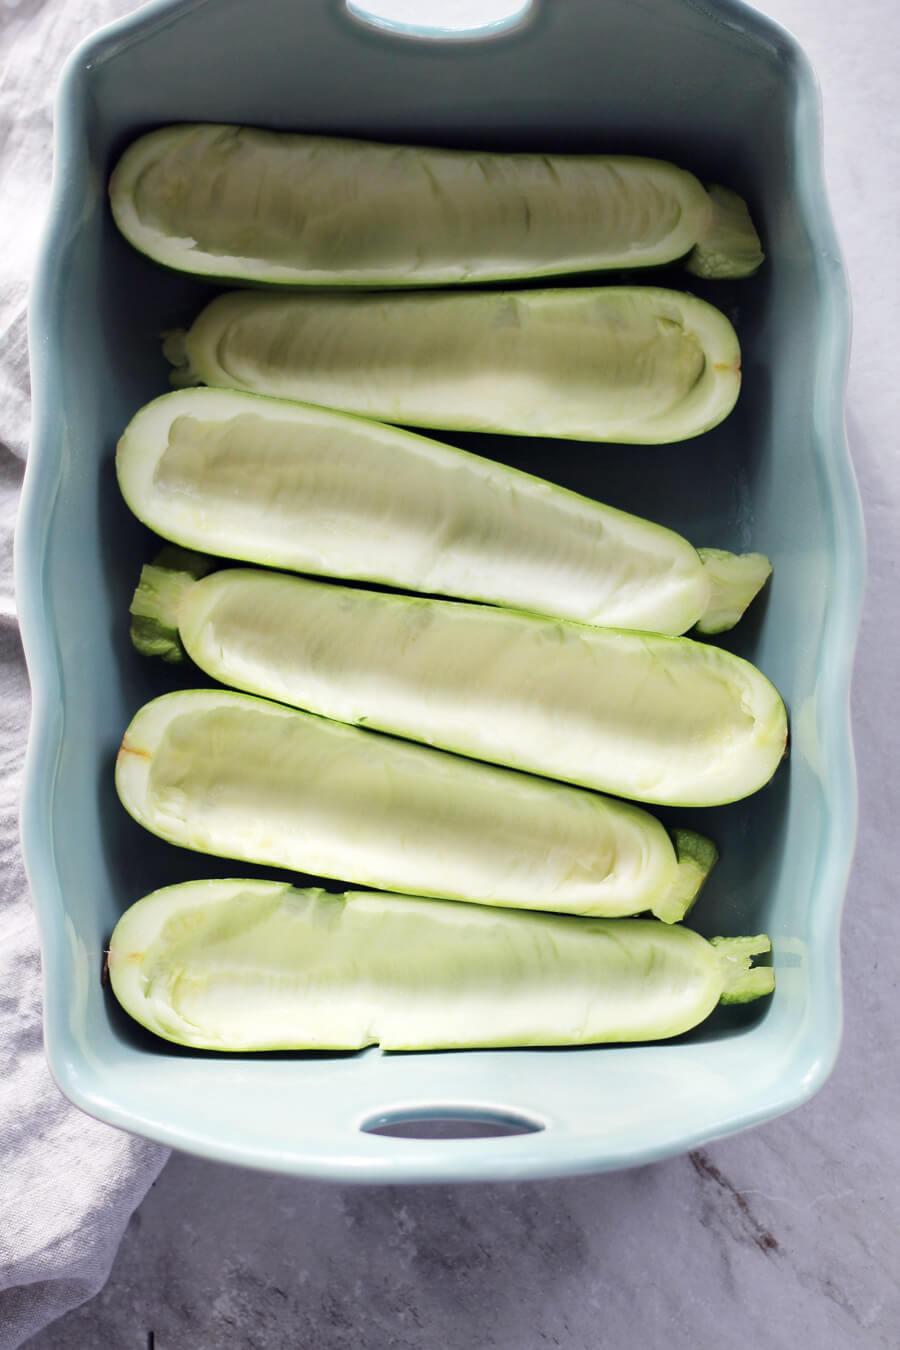 Prepared zucchini halves in a blue baking dish